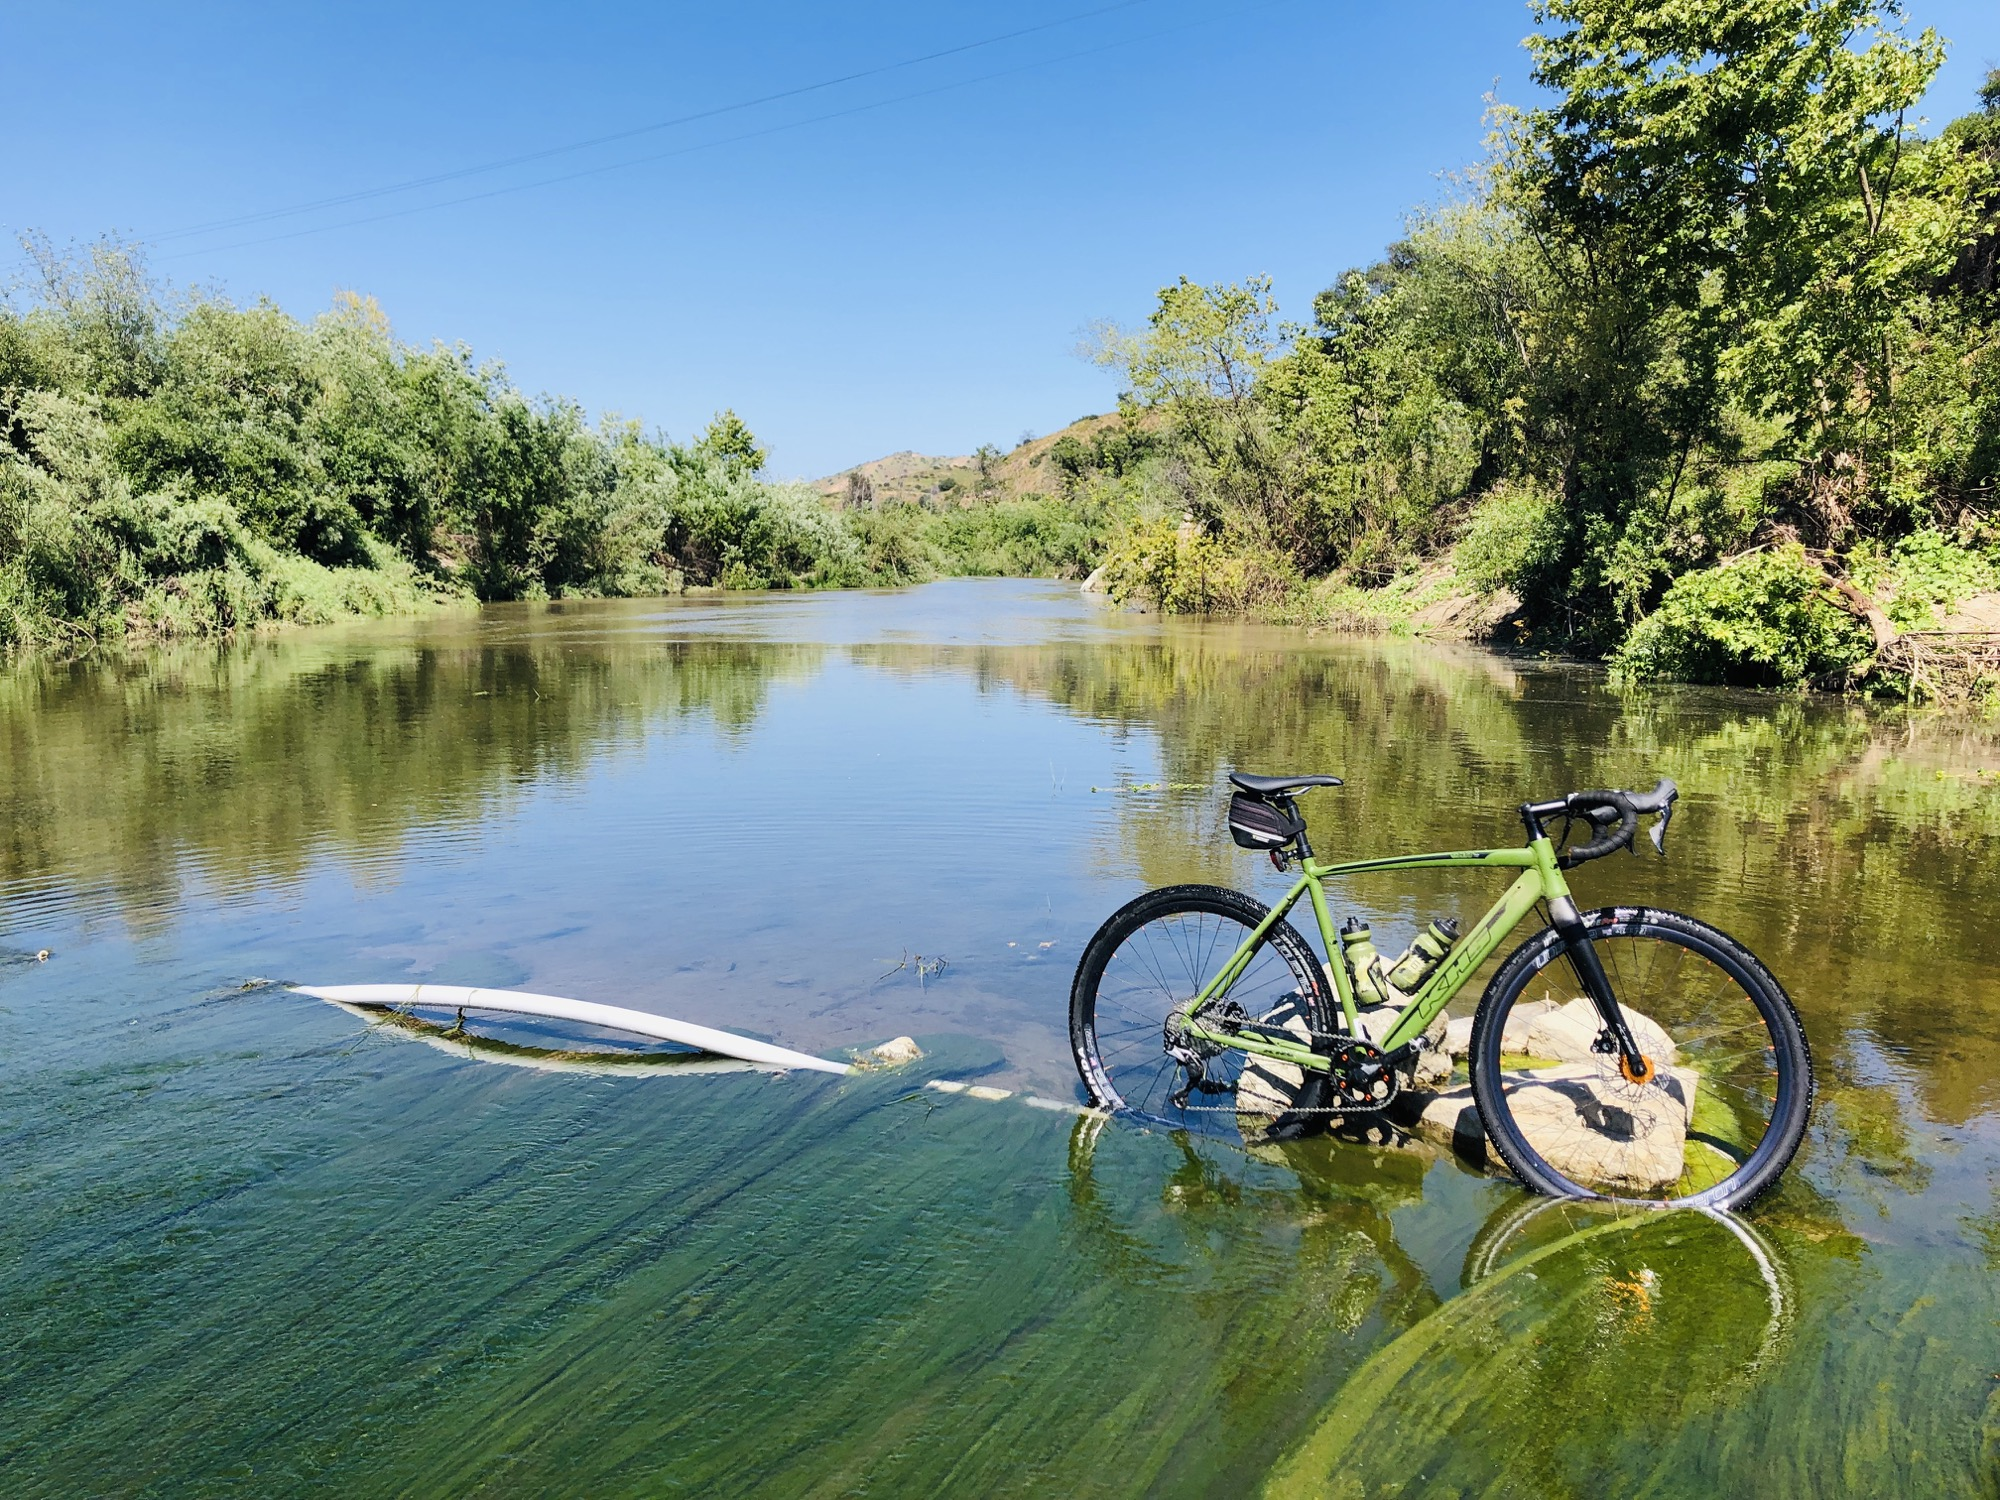 high water crossing